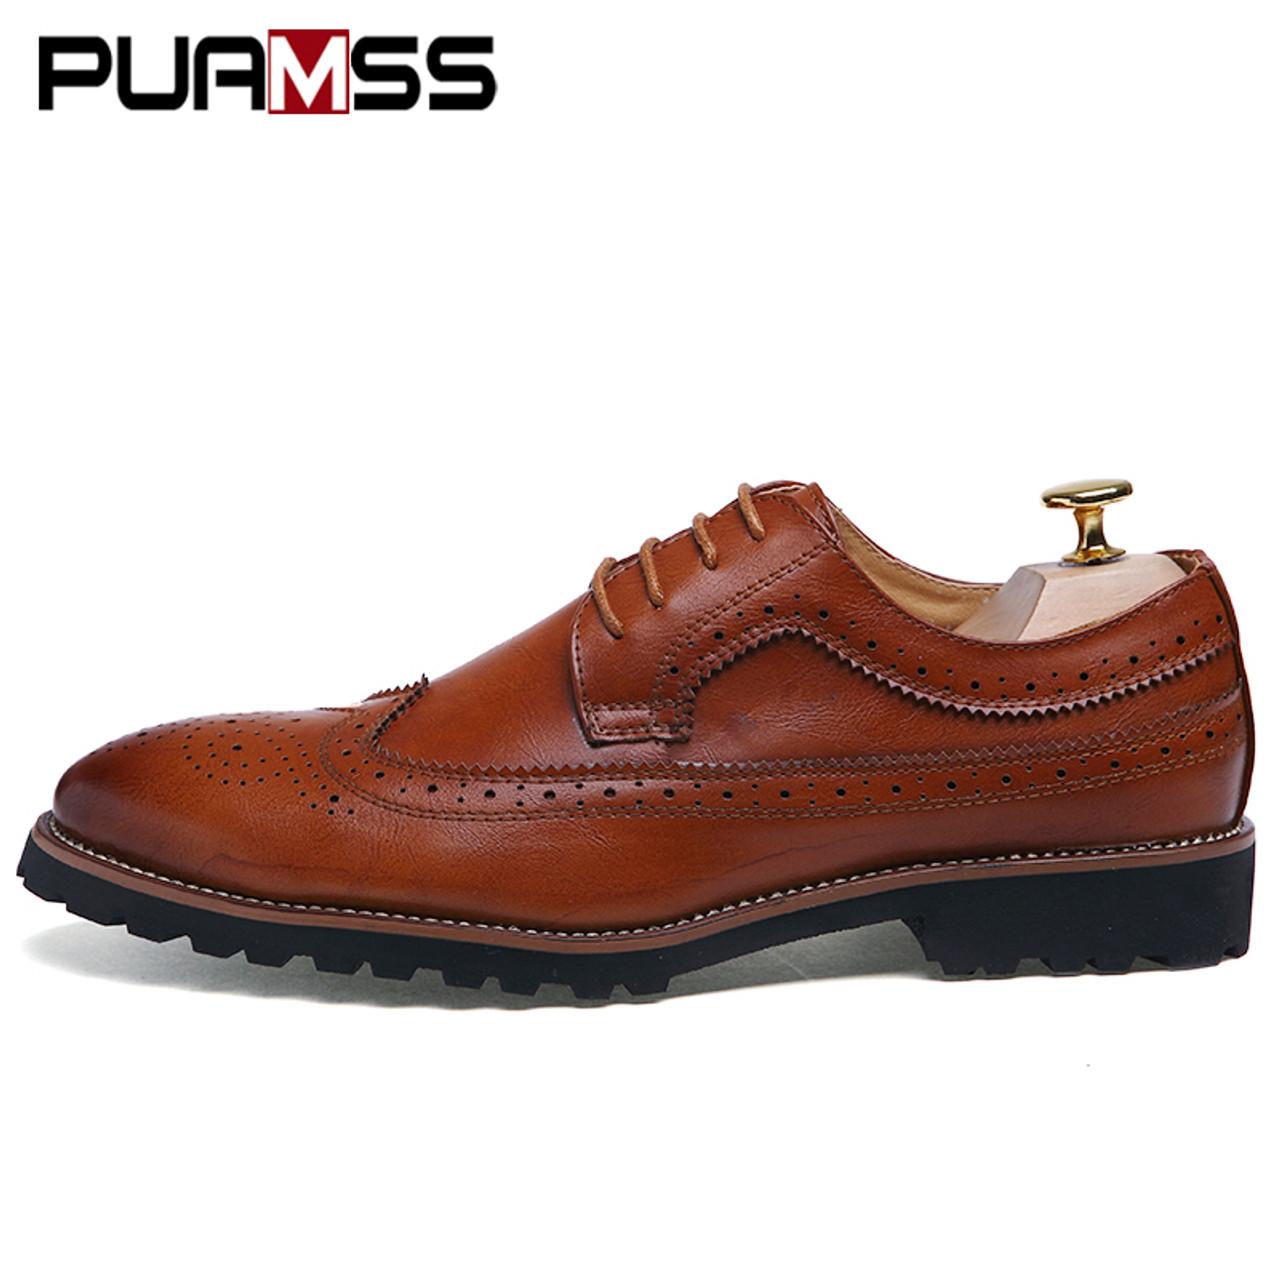 ffea0a20048 Men s Dress Shoes Fashion Brogue Floral Pattern Men Formal Shoes Leather  Luxury Wedding Shoes Red Wine Men Oxford Plus Size 45